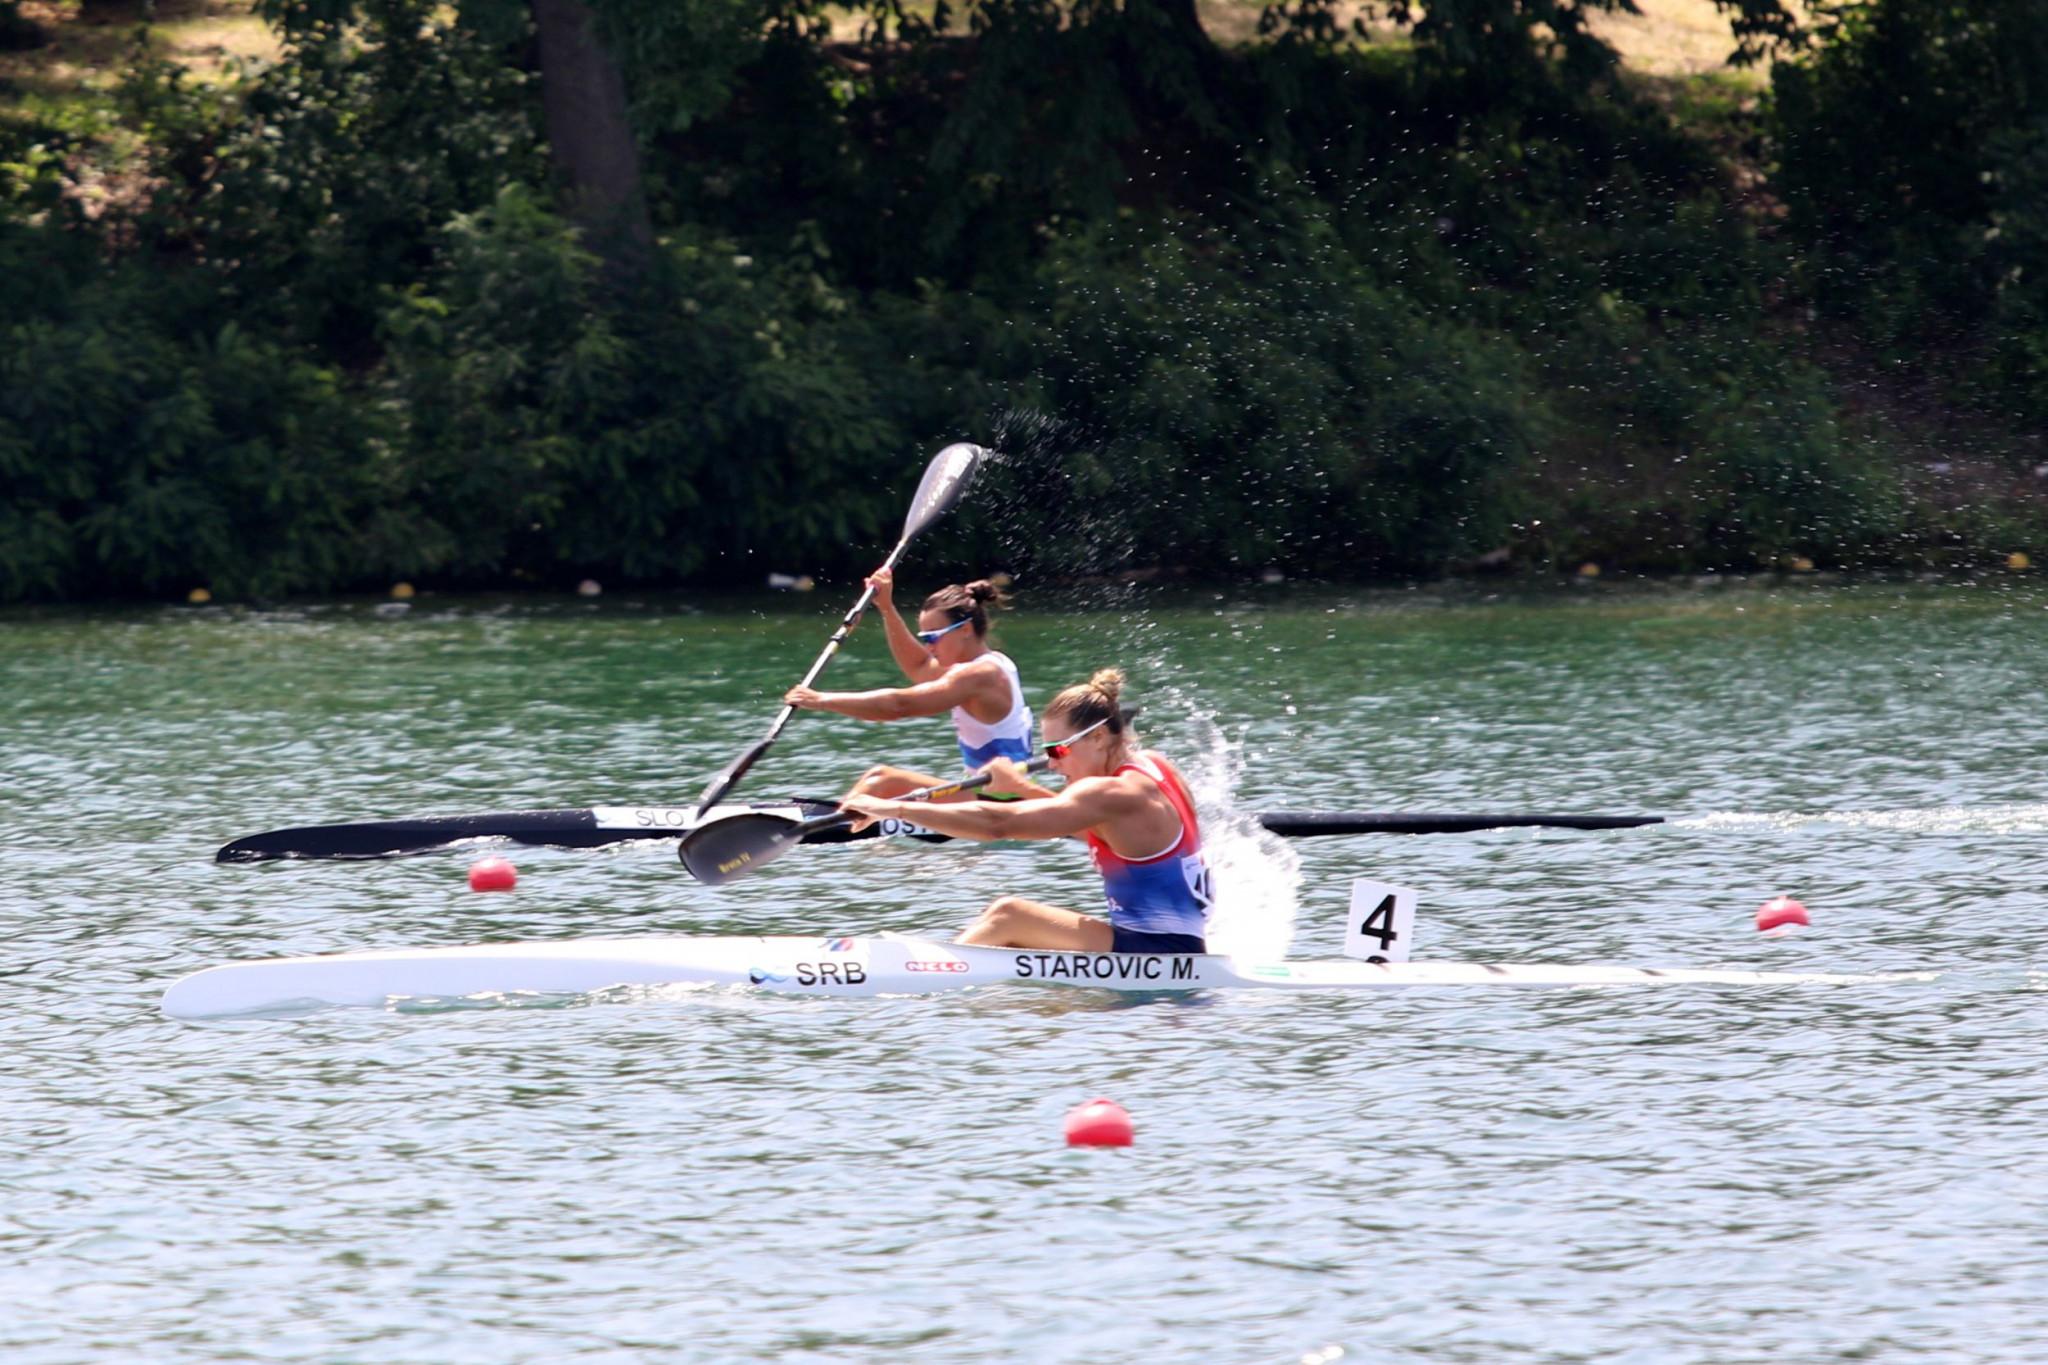 Starović shows speed at home European Canoe Sprint Championships